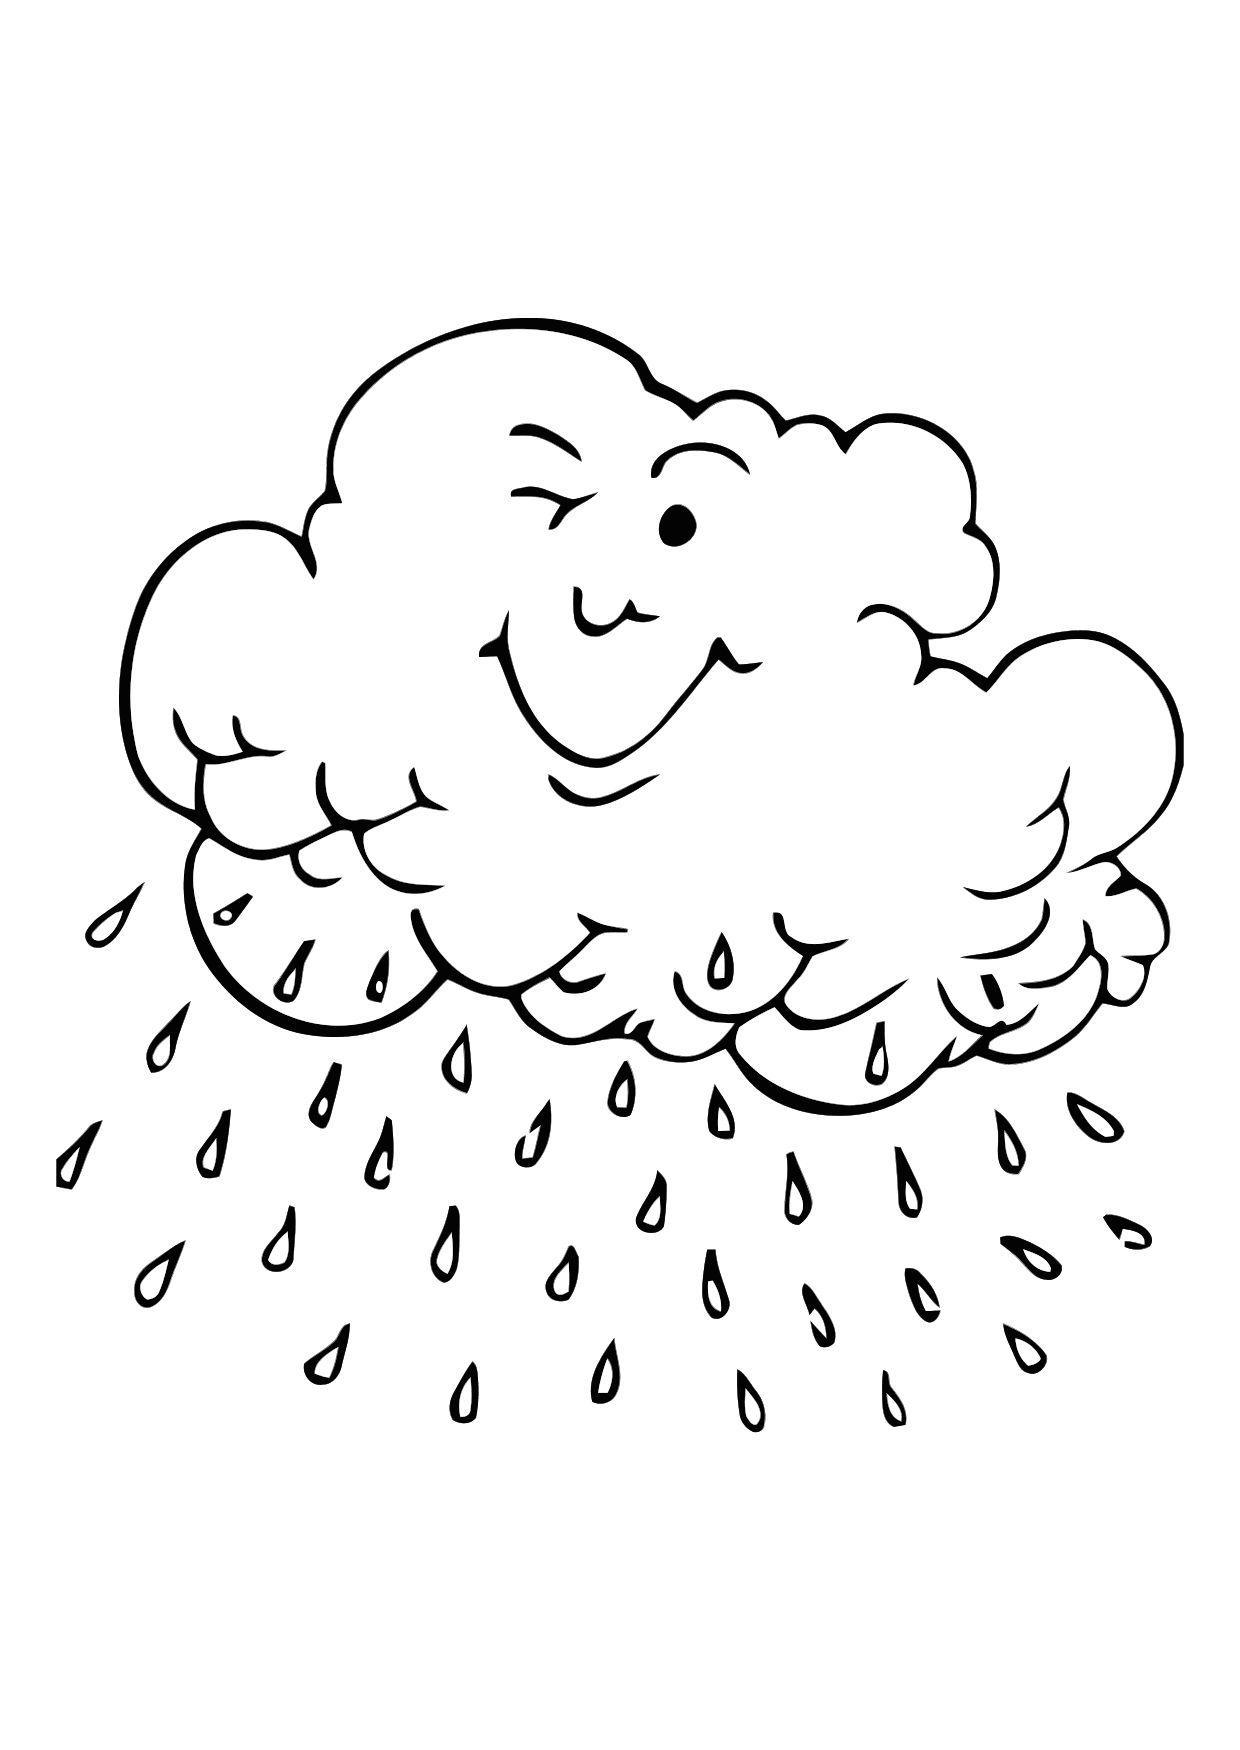 Coloriage nuage de pluie img 11401 - Dessin de nuage a imprimer ...